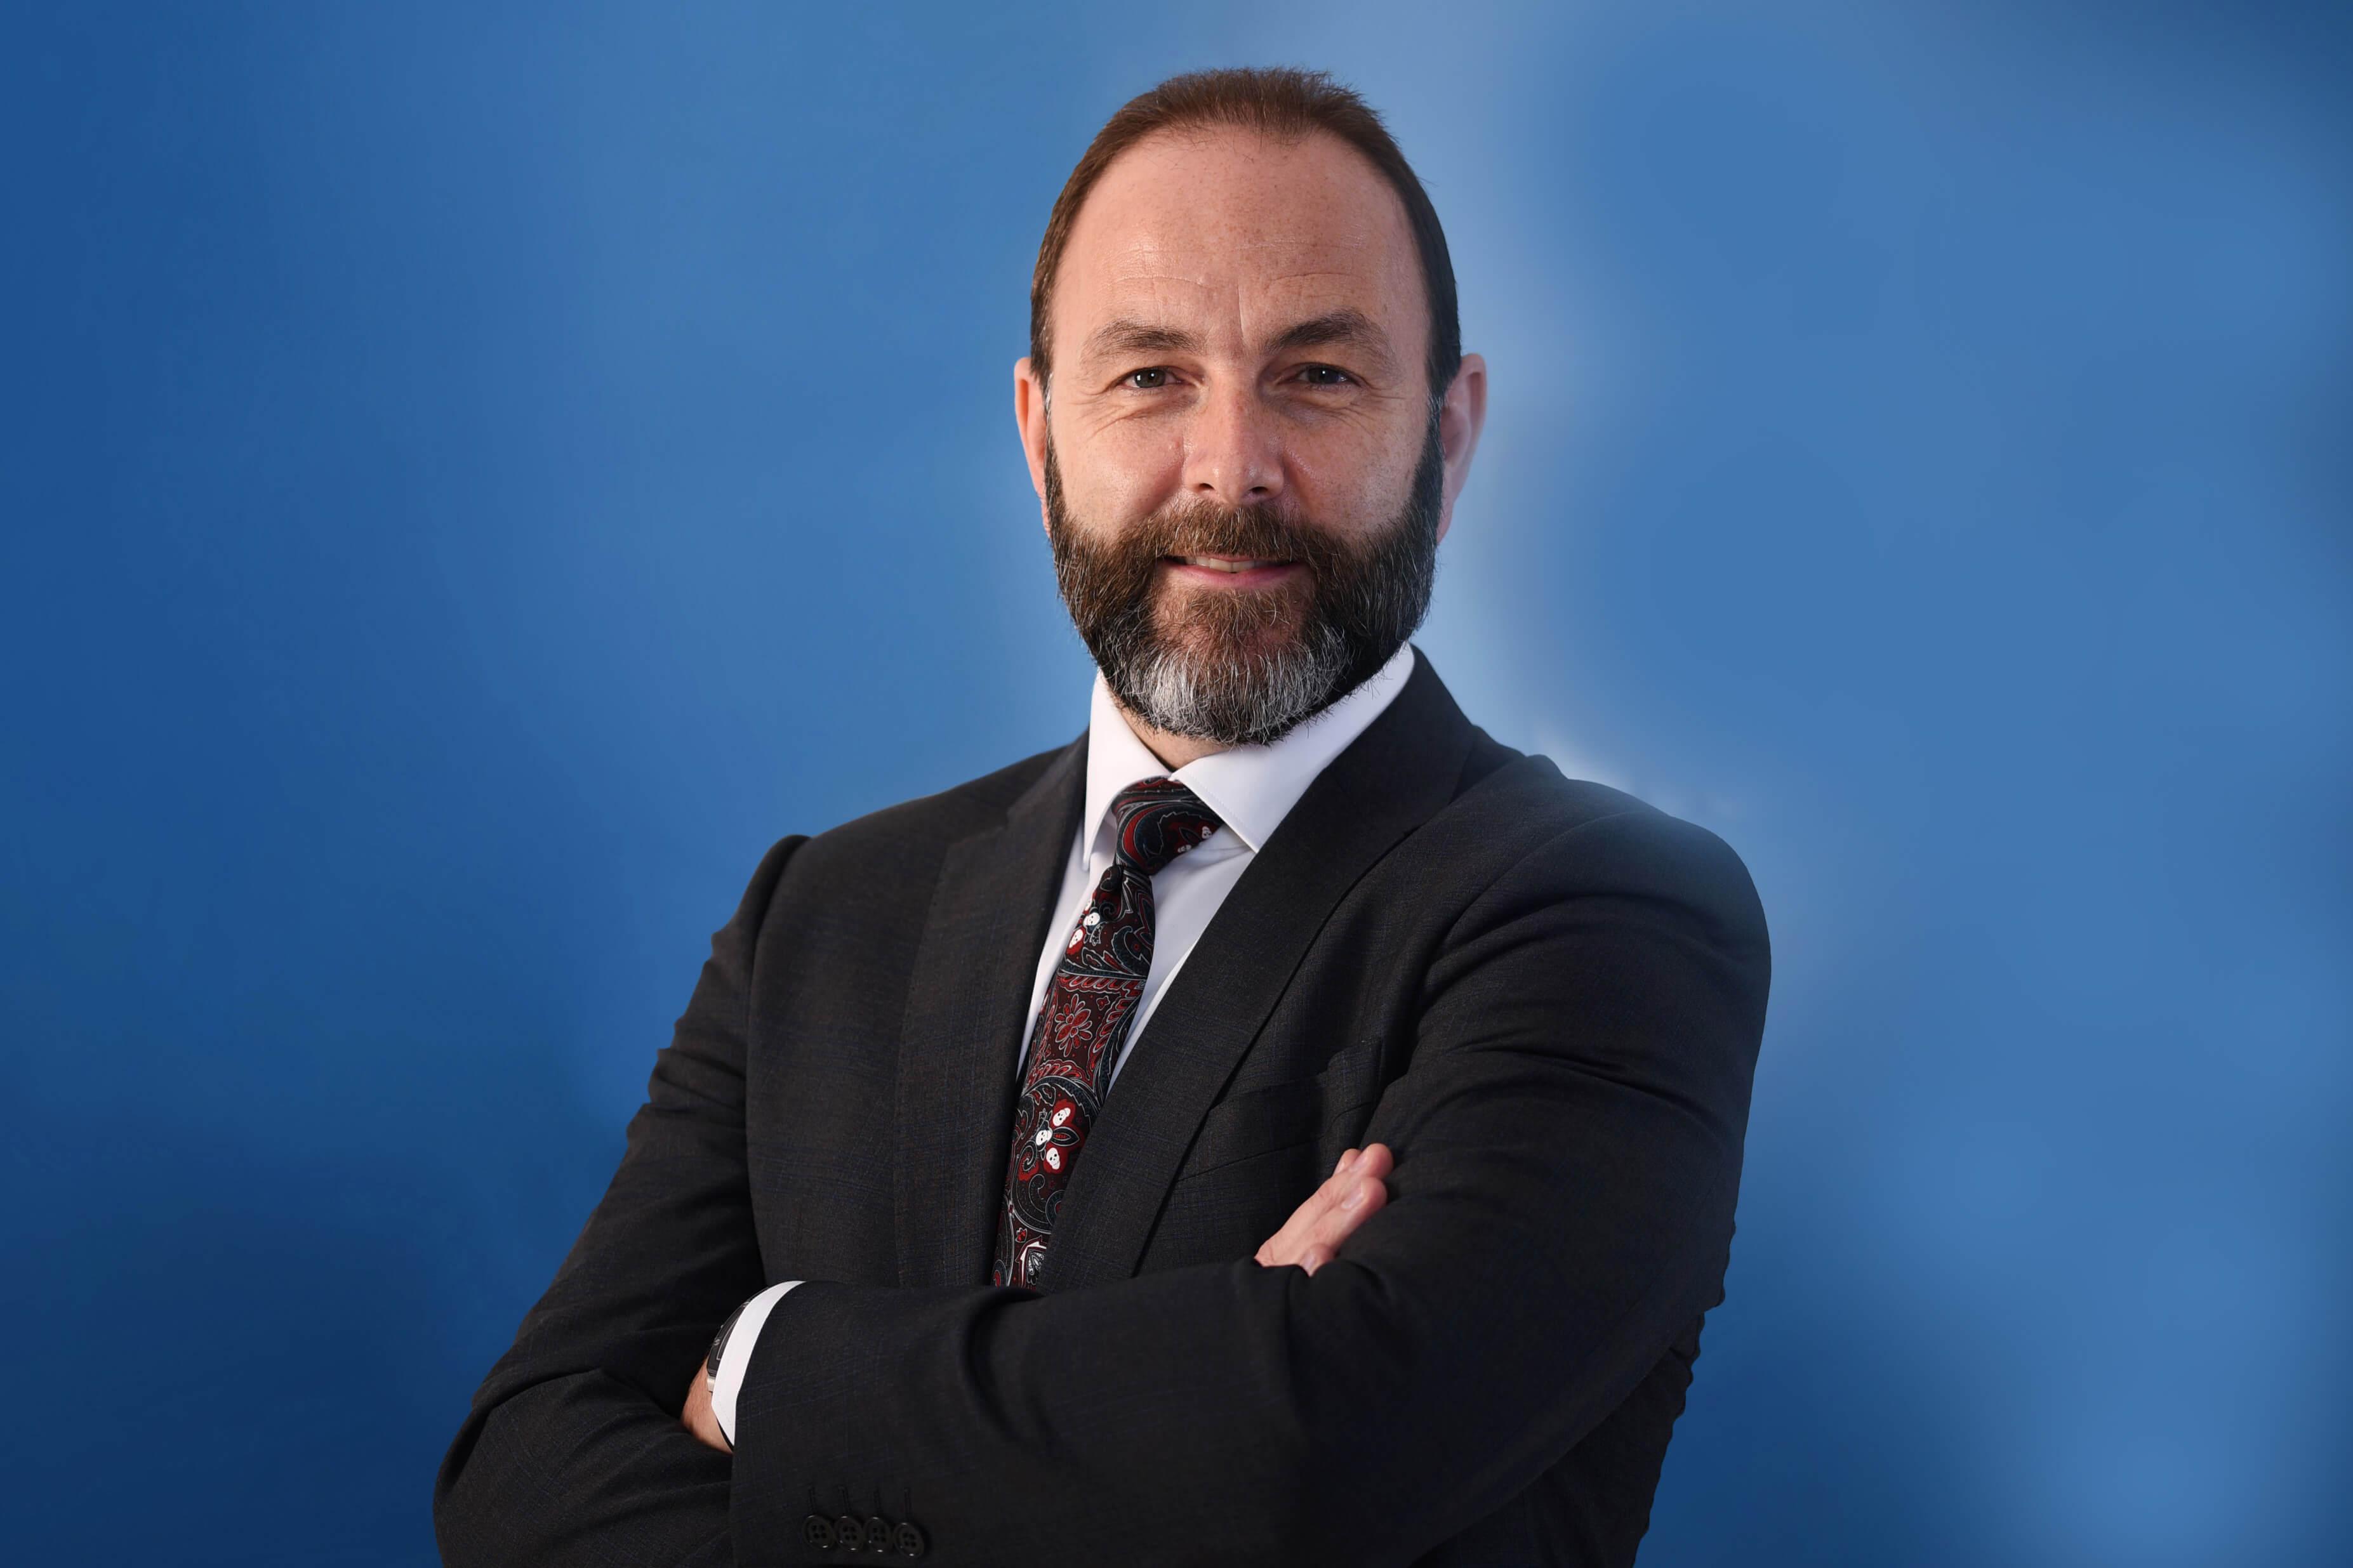 David Meads, Cisco